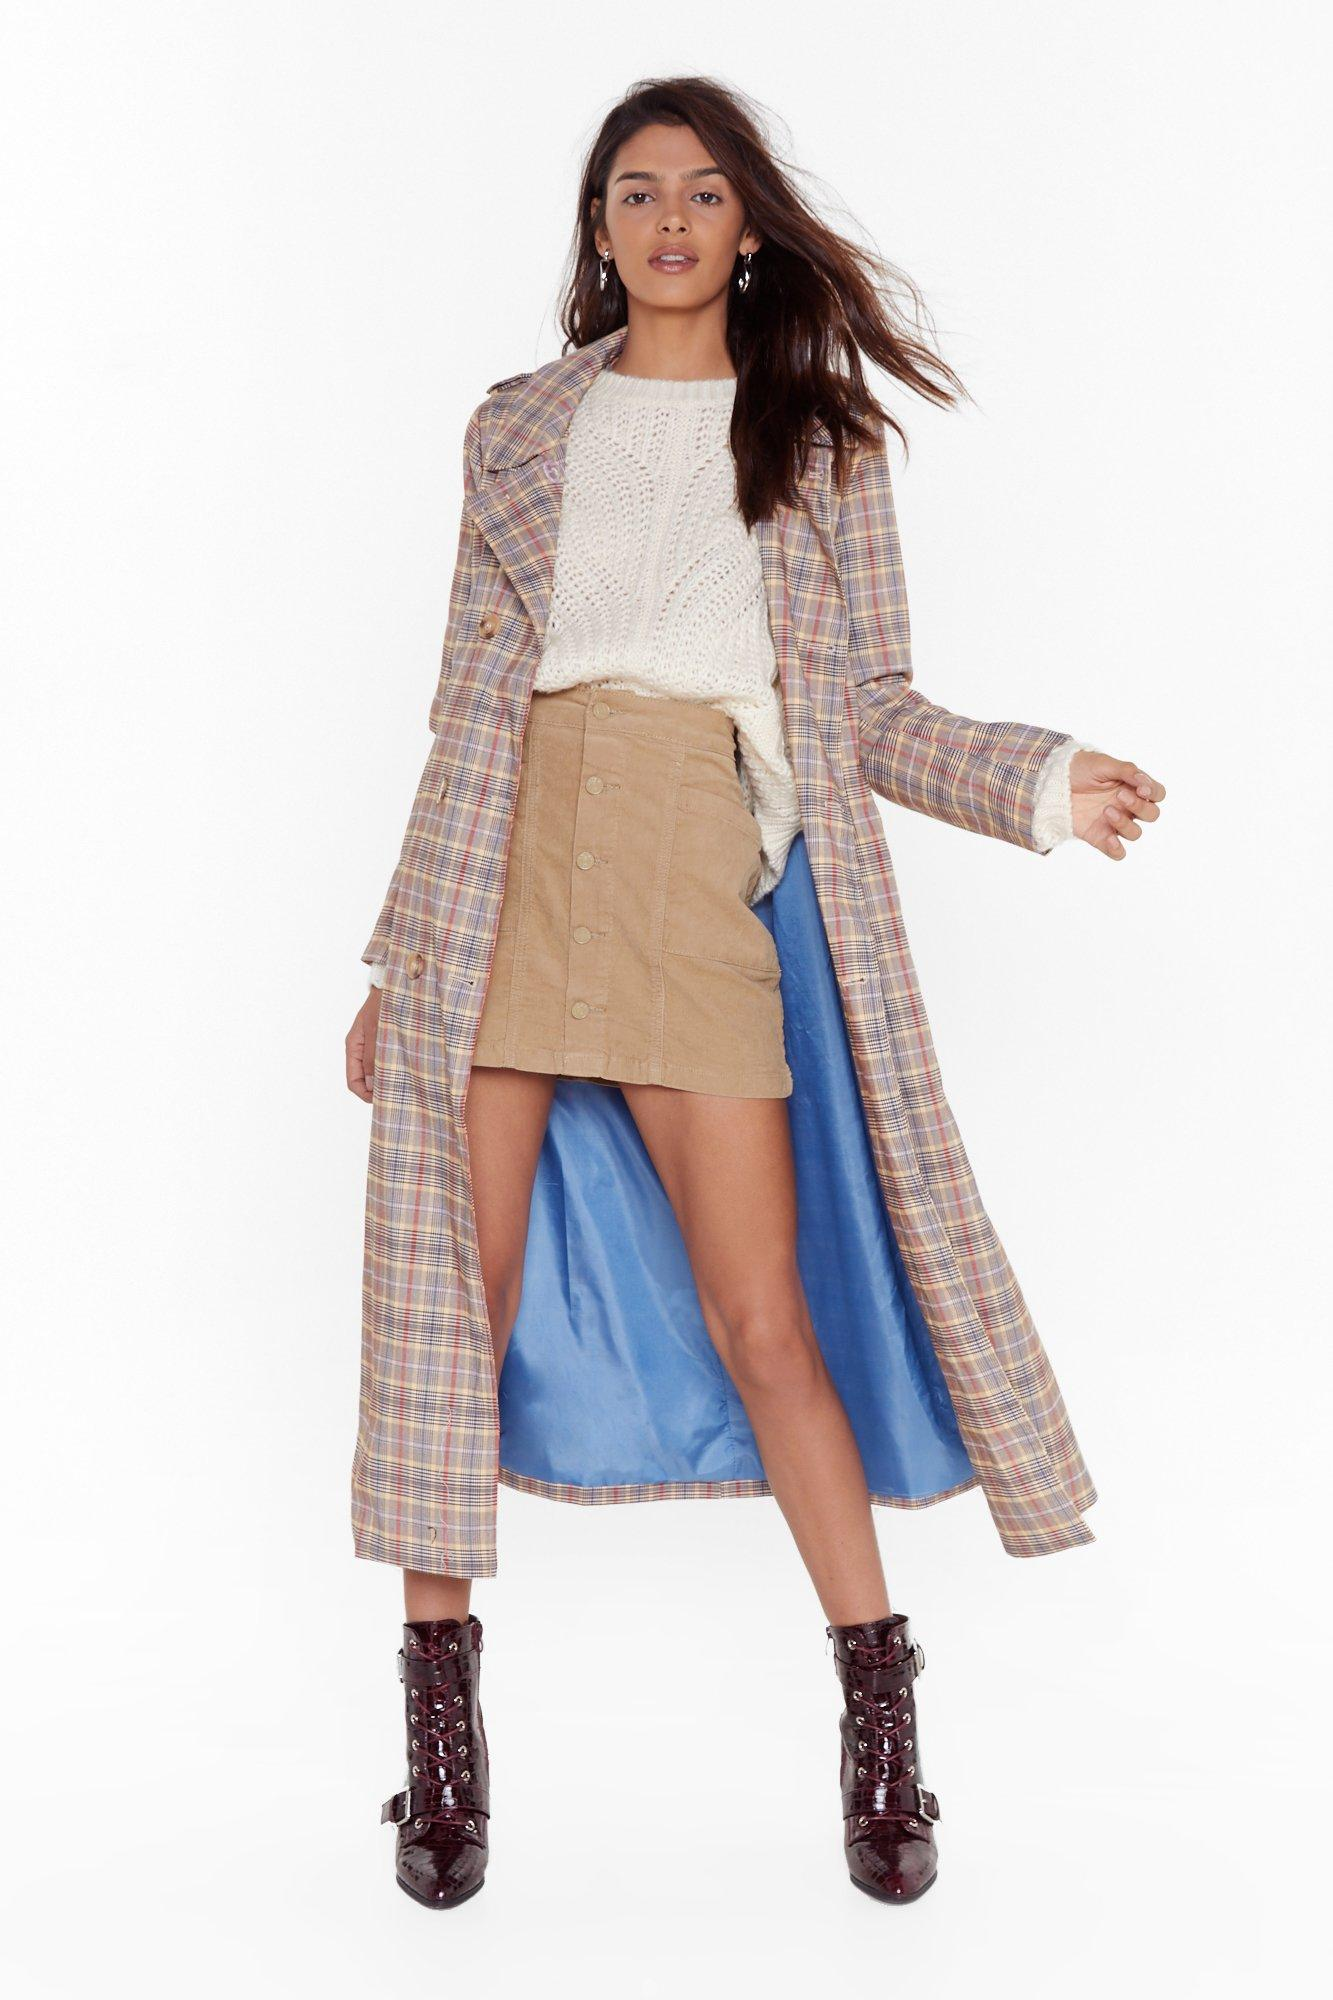 Image of One More Skirt Corduroy Mini Skirt